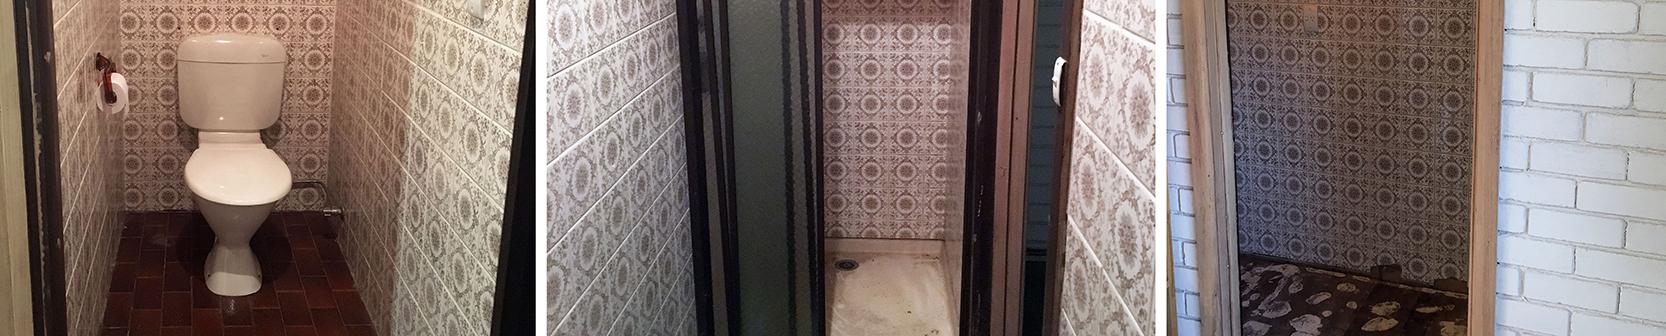 80sbathroom.jpg